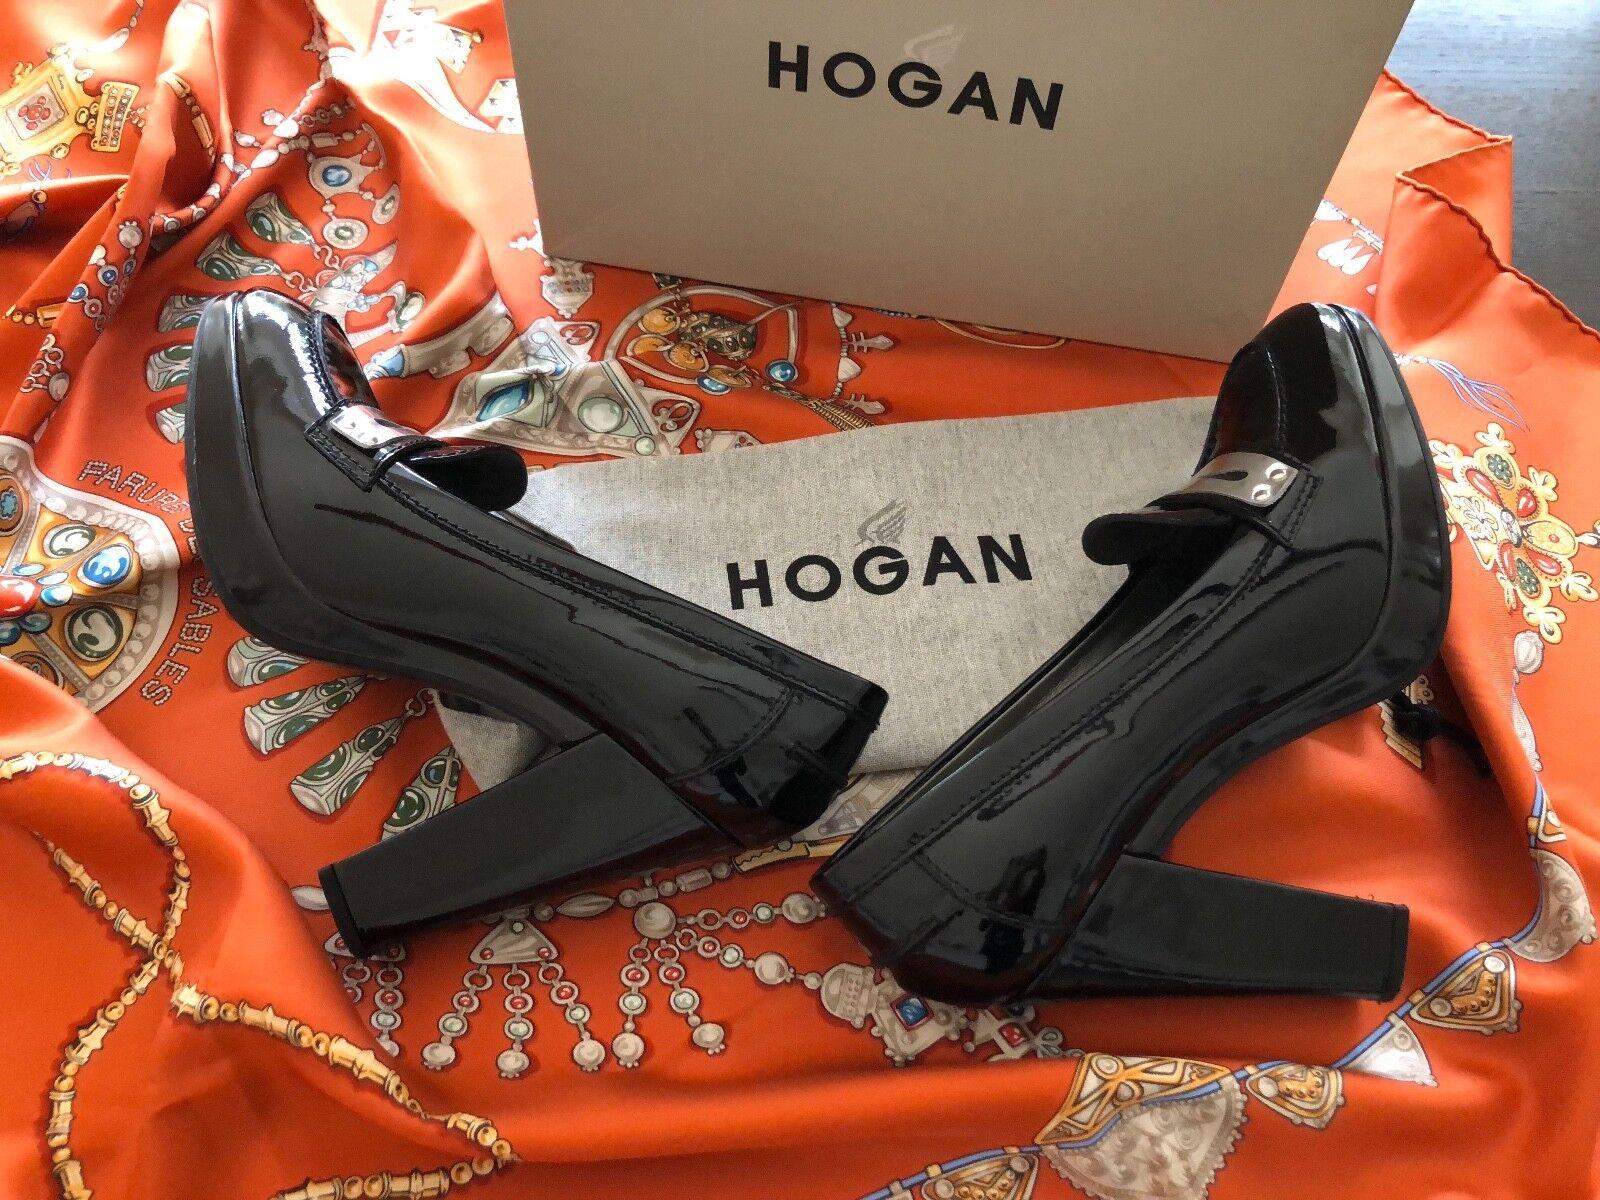 HOGAN 39,5  High Heels Plateau PUMPS Lack Leder Gr. 39,5 HOGAN College-Stil  wie neu 8cb22f